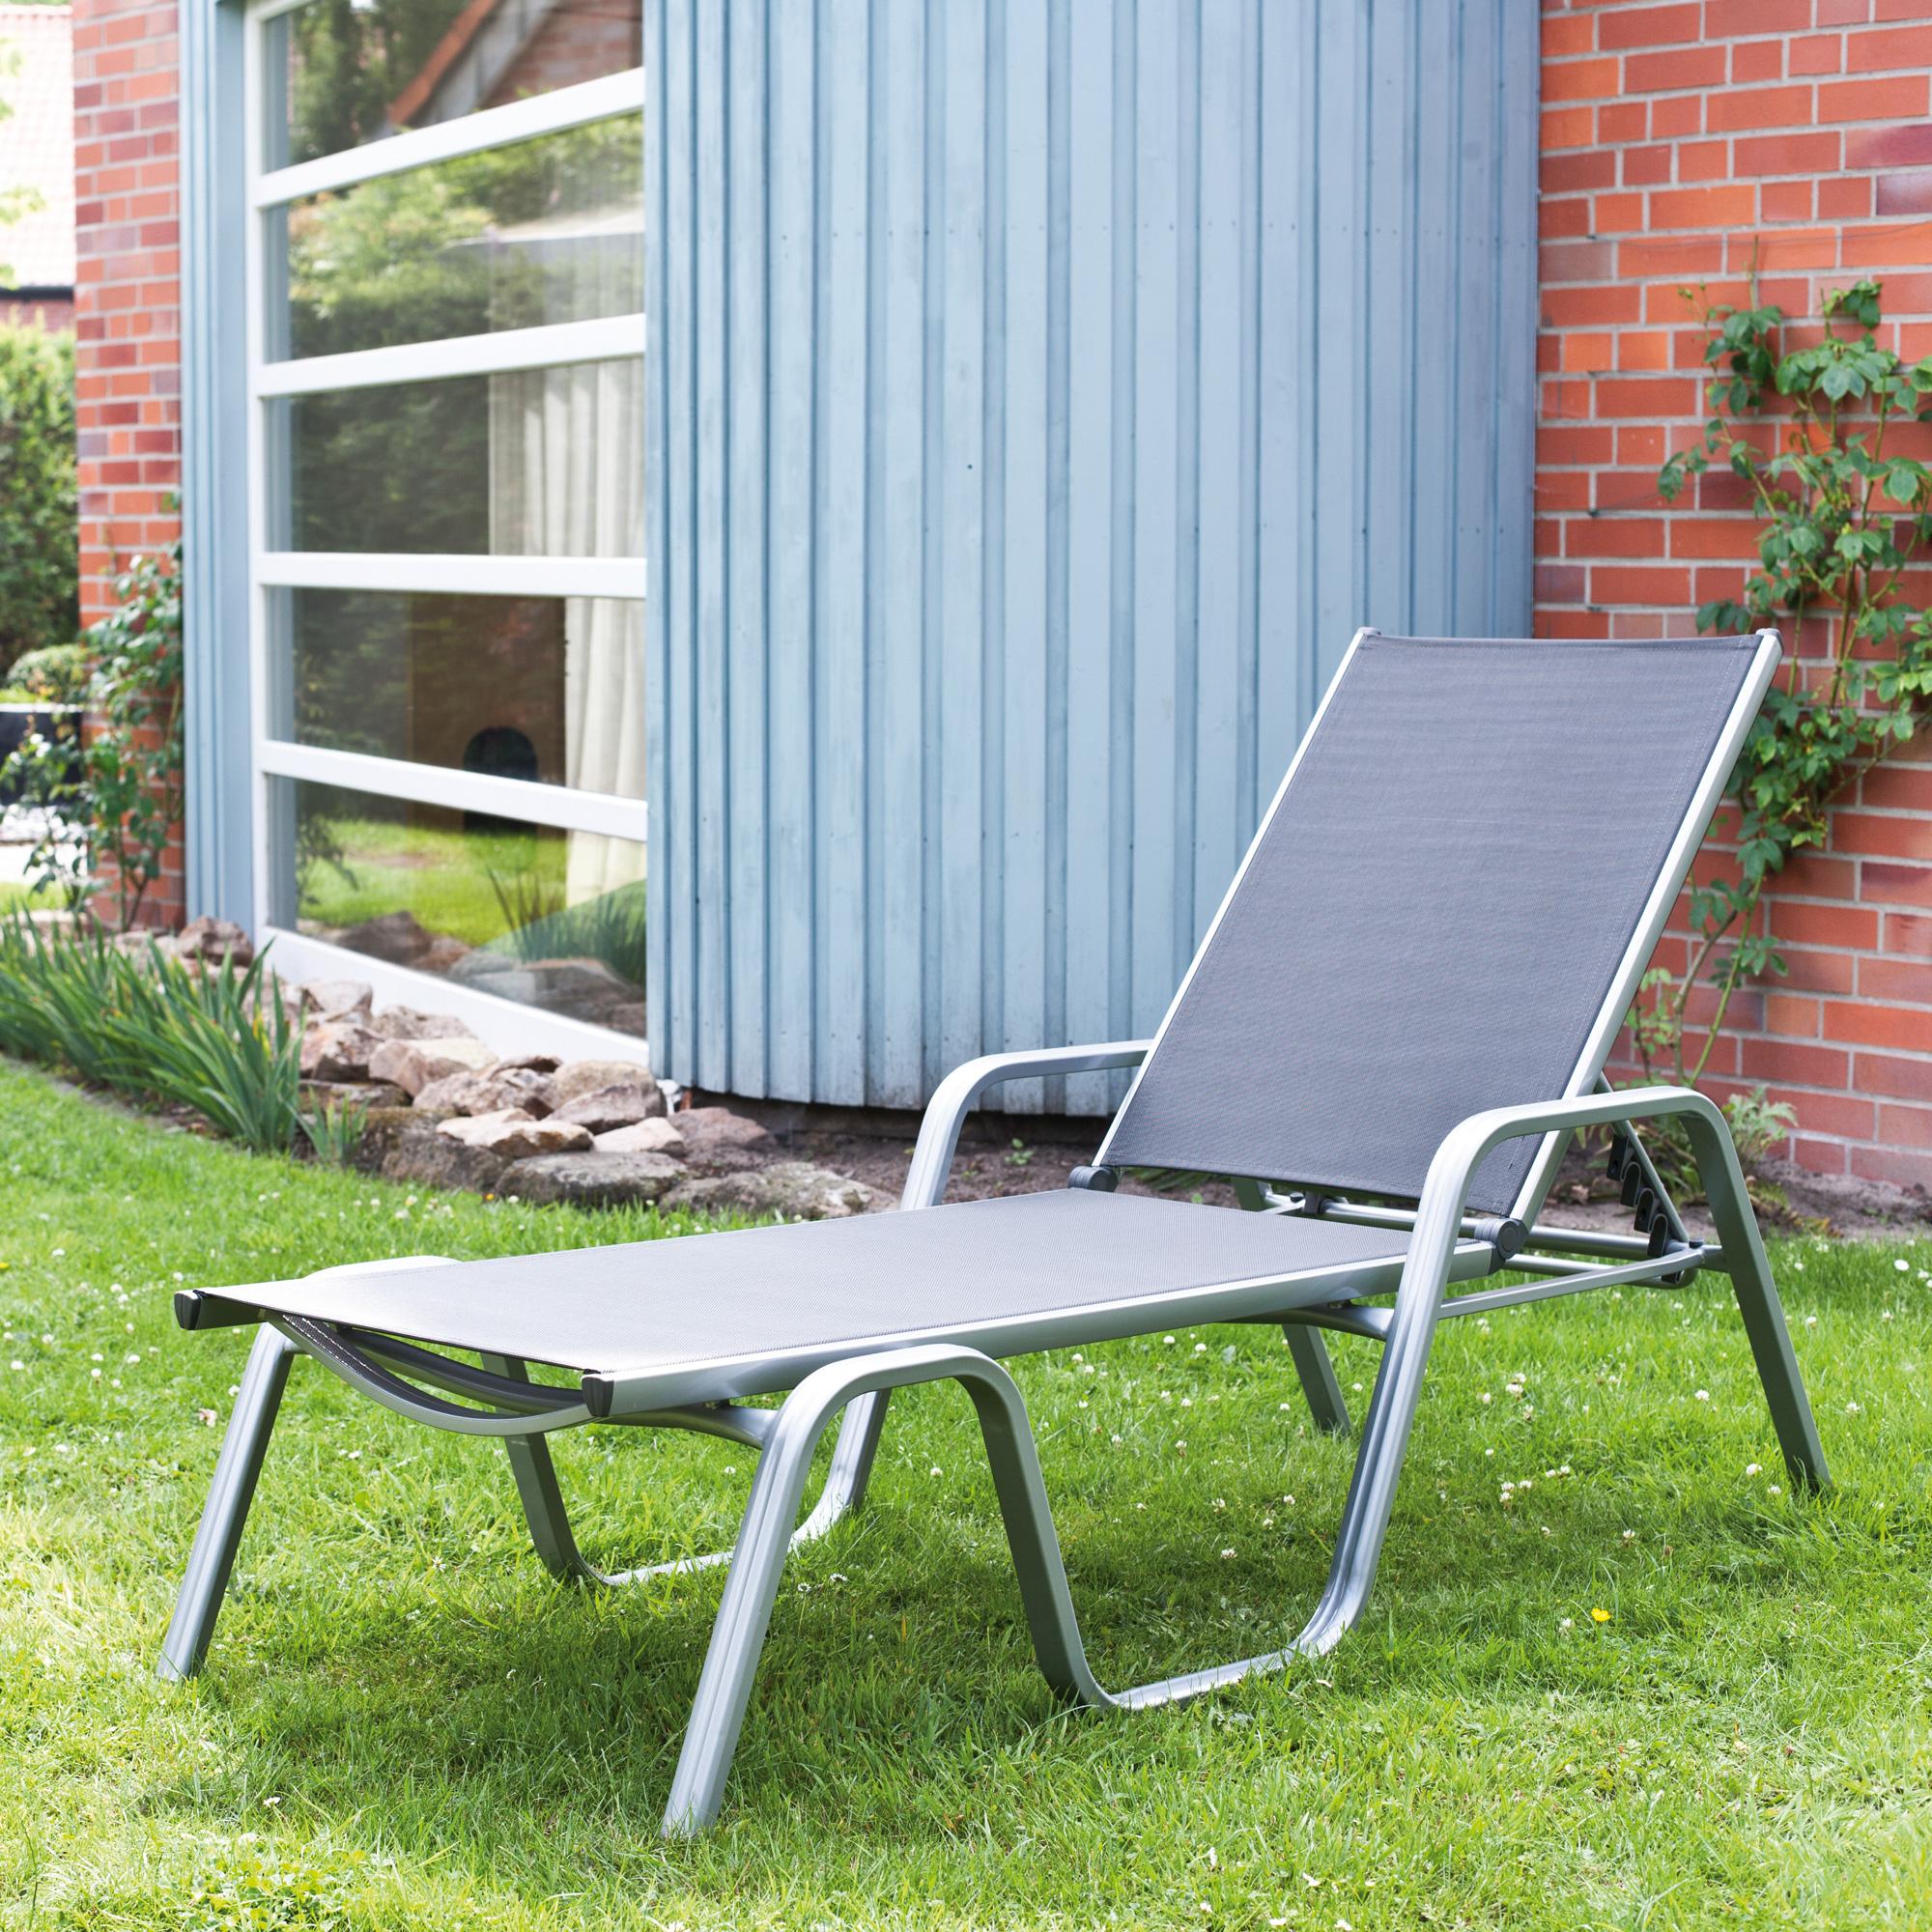 kettler basic plus sonnenliege stapelbar 0301214 0000. Black Bedroom Furniture Sets. Home Design Ideas